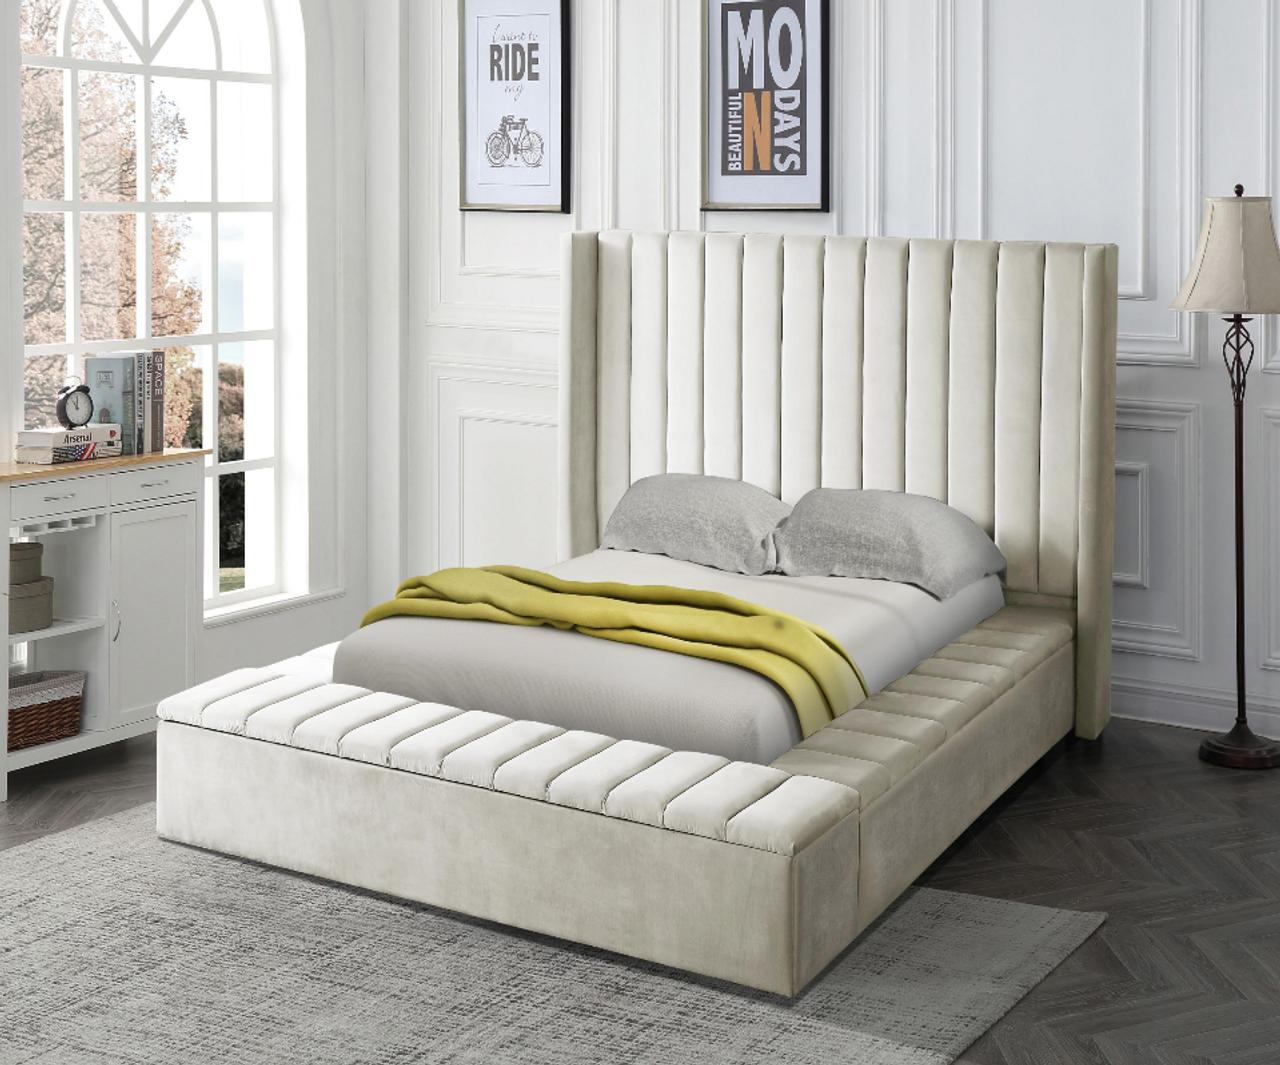 Black Upholstered Bed W Storage